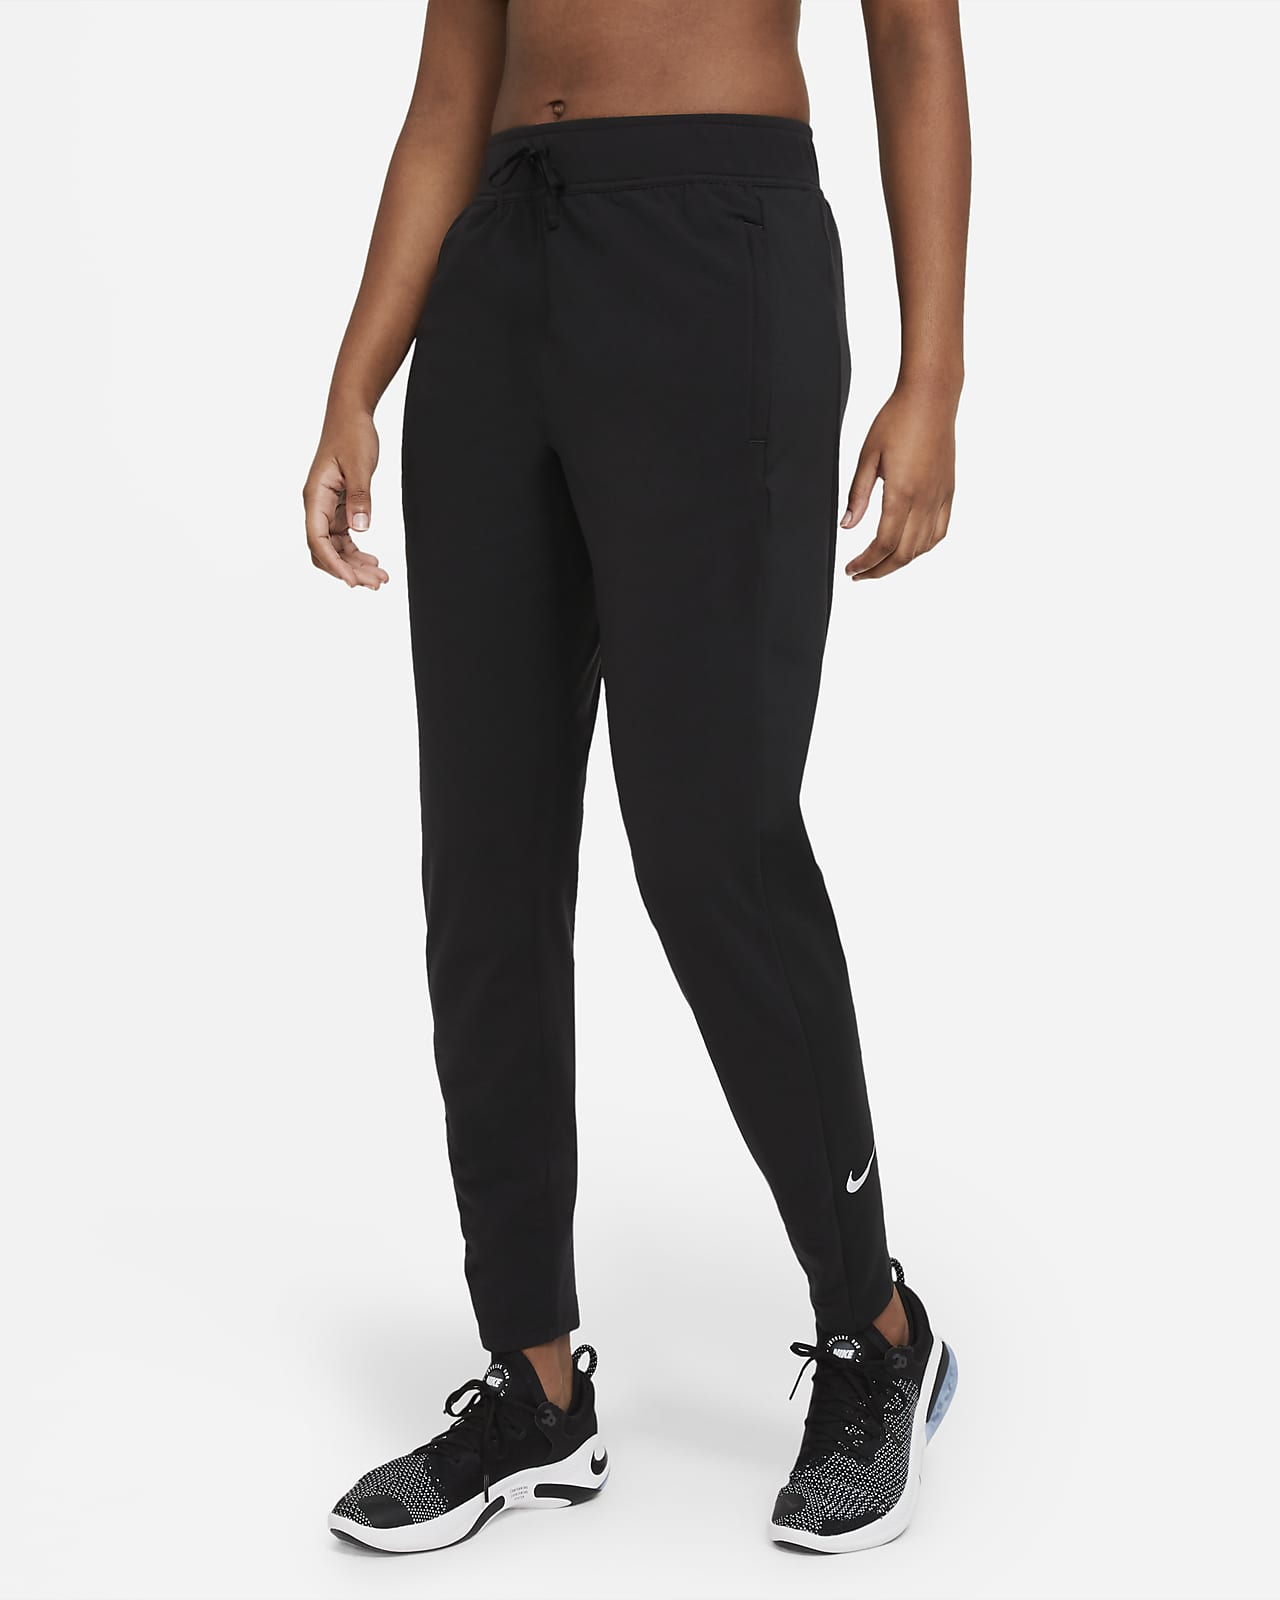 Pantaloni da running Nike Essential Warm - Donna